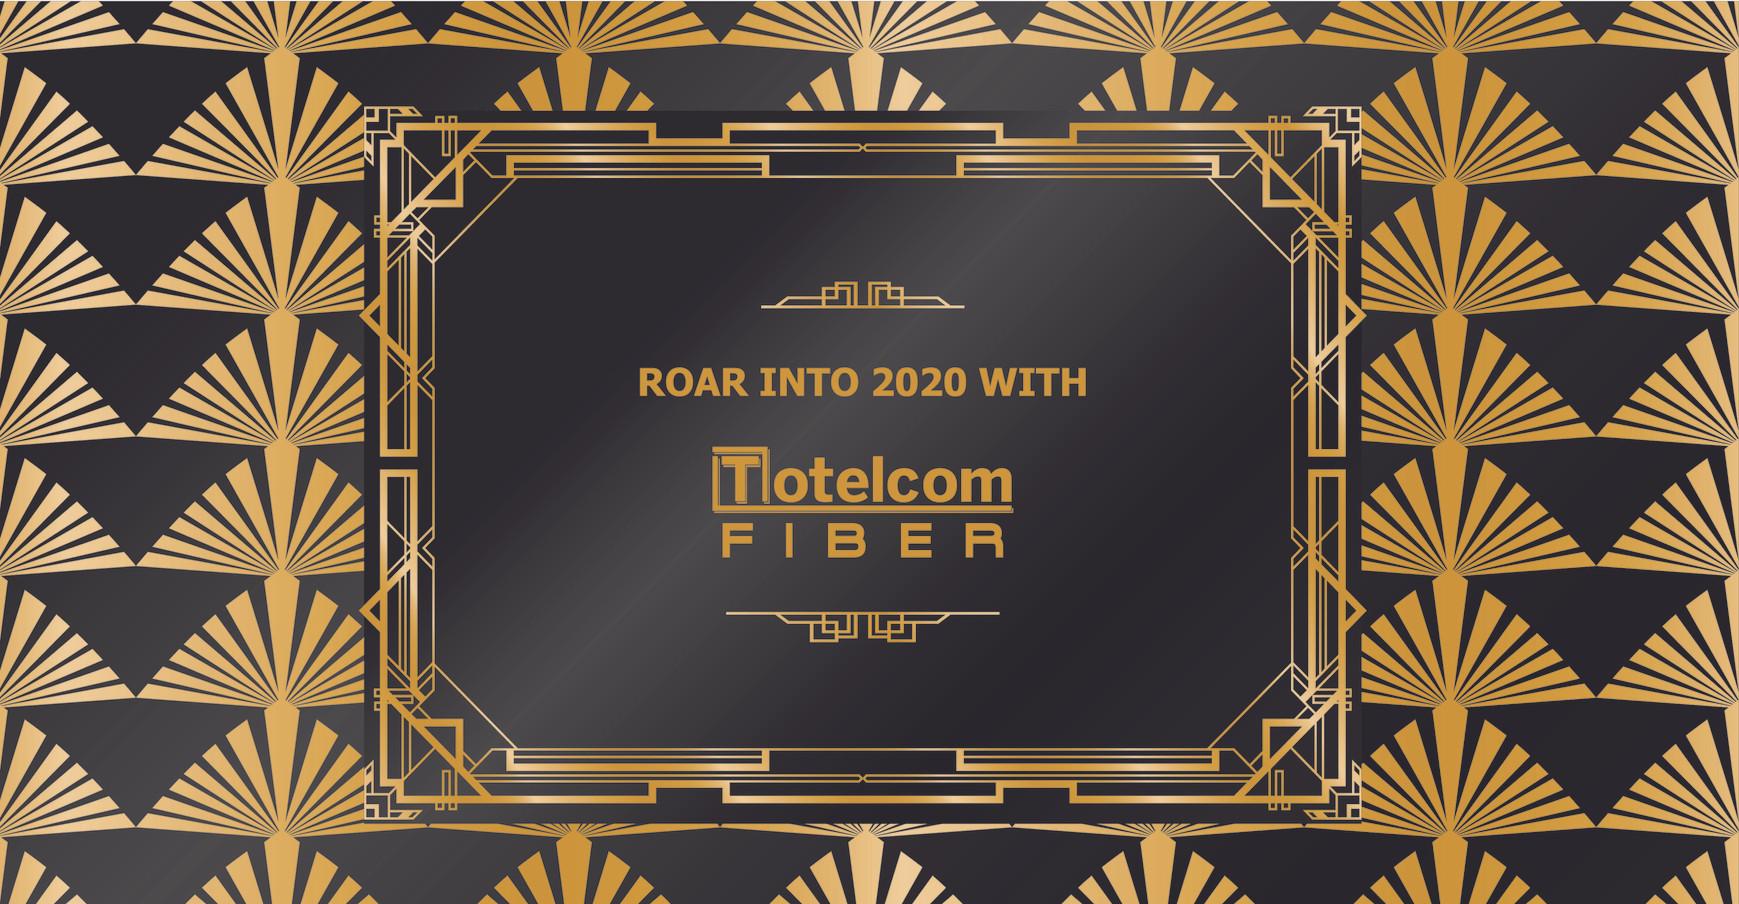 Totelcom Ad Work